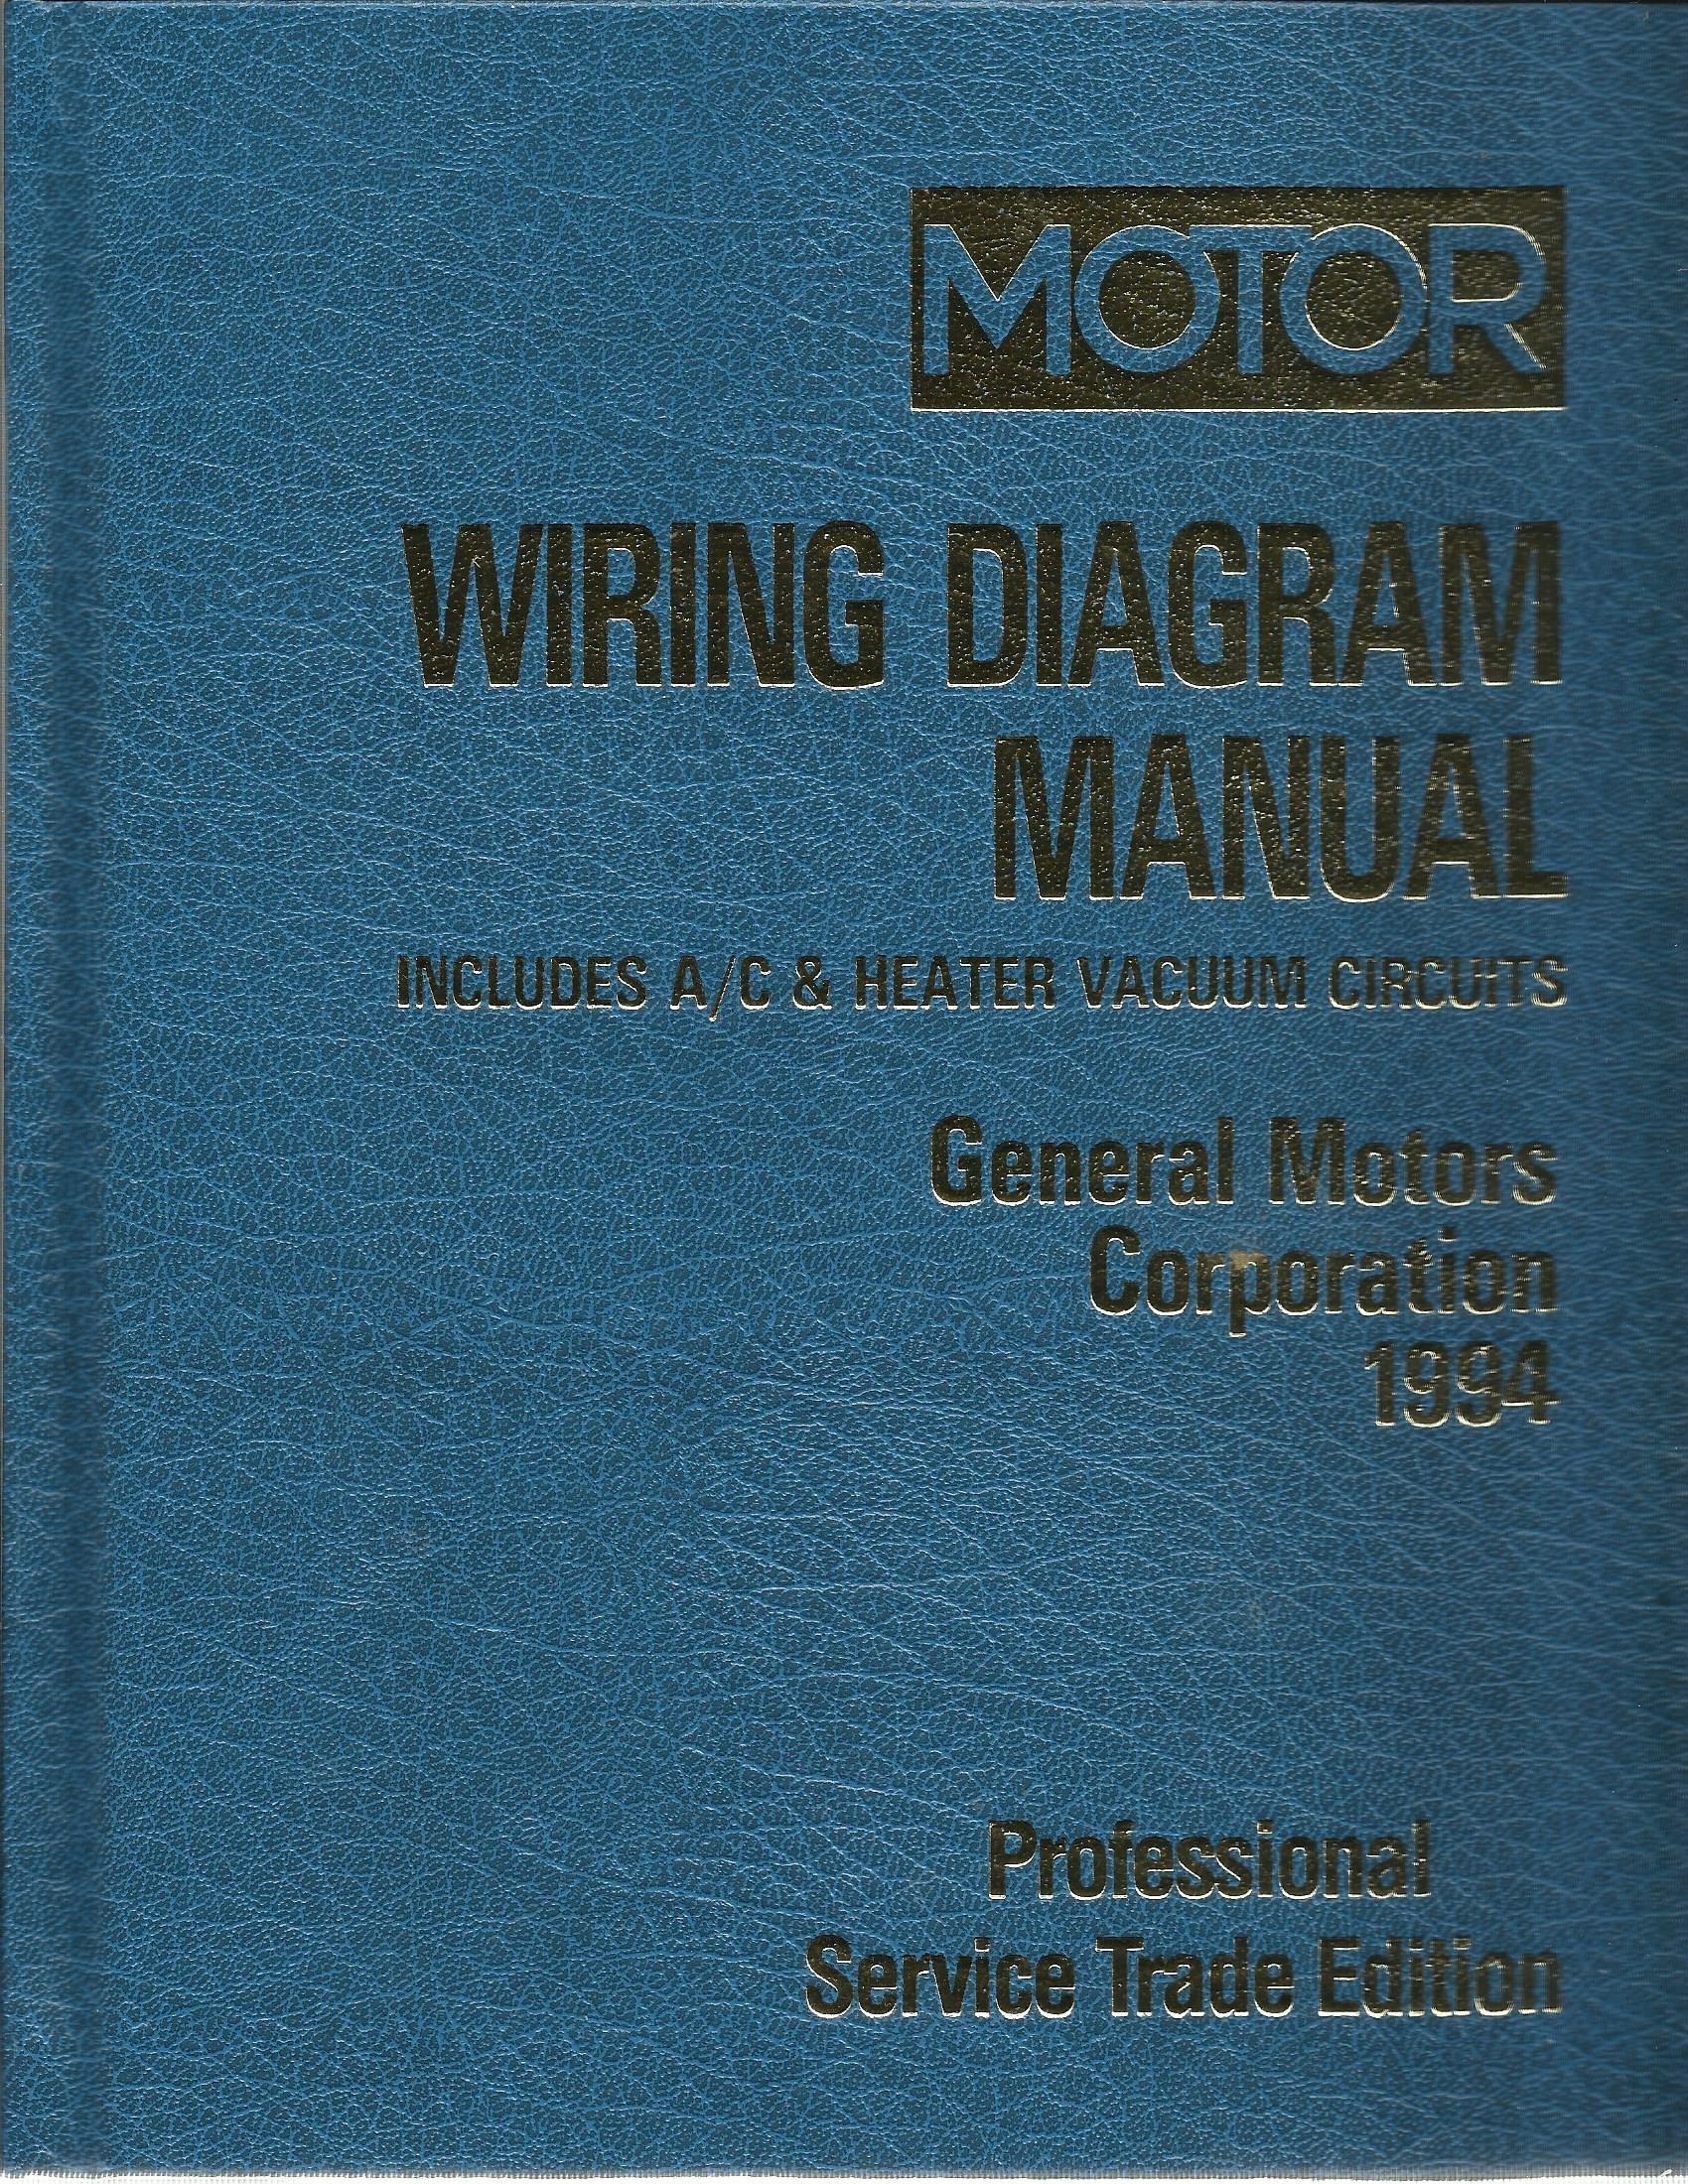 Motor 1994 General Motors Wiring Diagram Manual Includes A C Heater Vacuum Circuits Professional Service Trade Edition Domestic